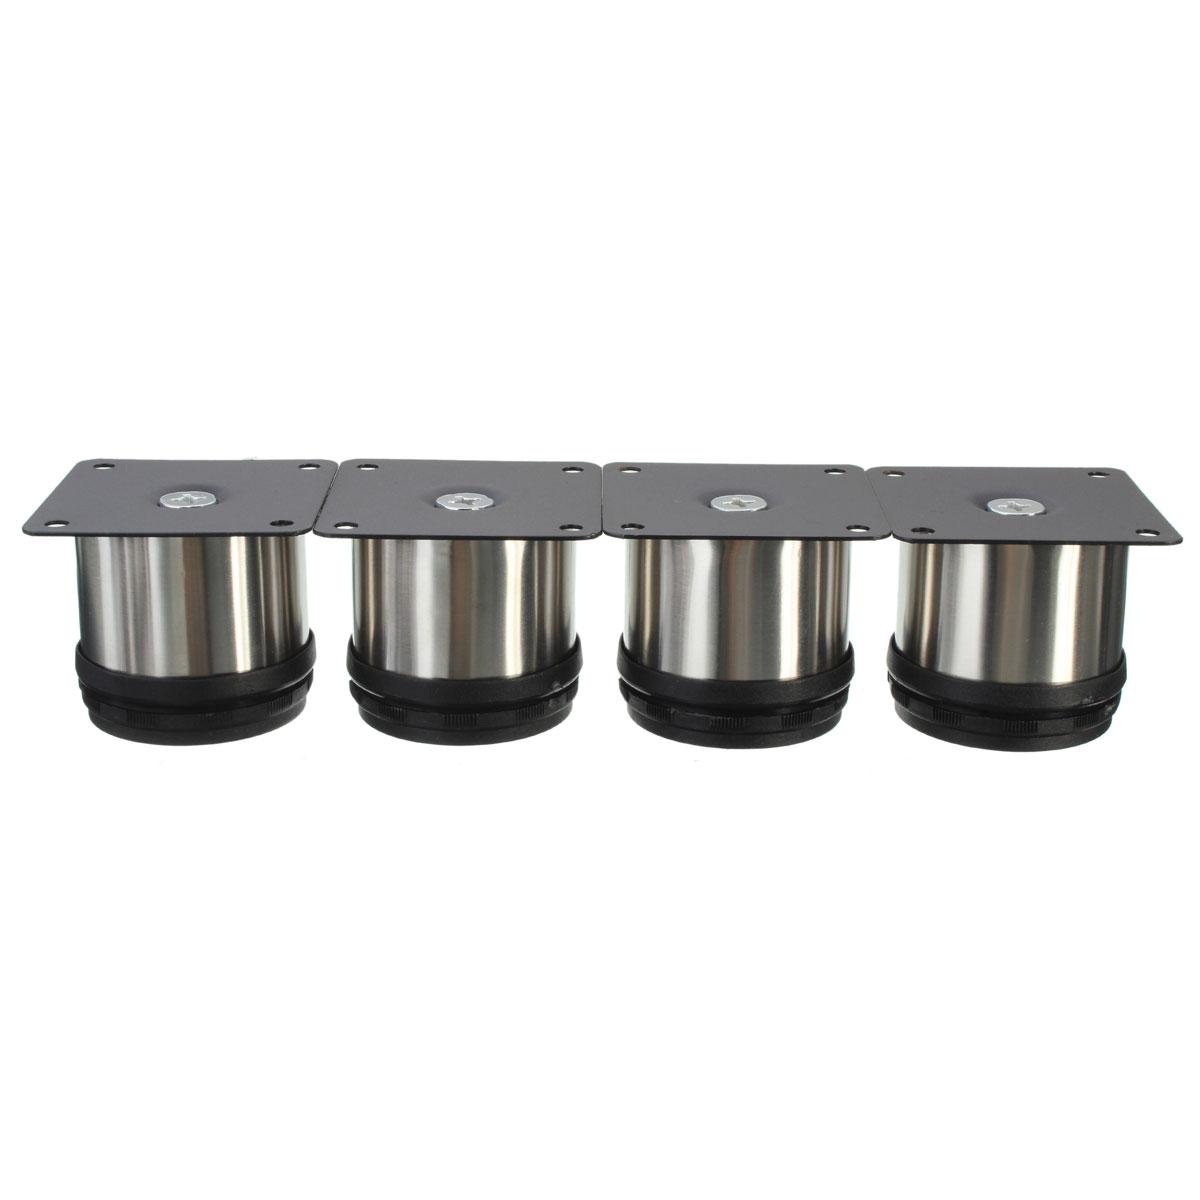 4Pcs Cabinet Legs Adjustable Stainless Steel Kitchen Feet Round ...